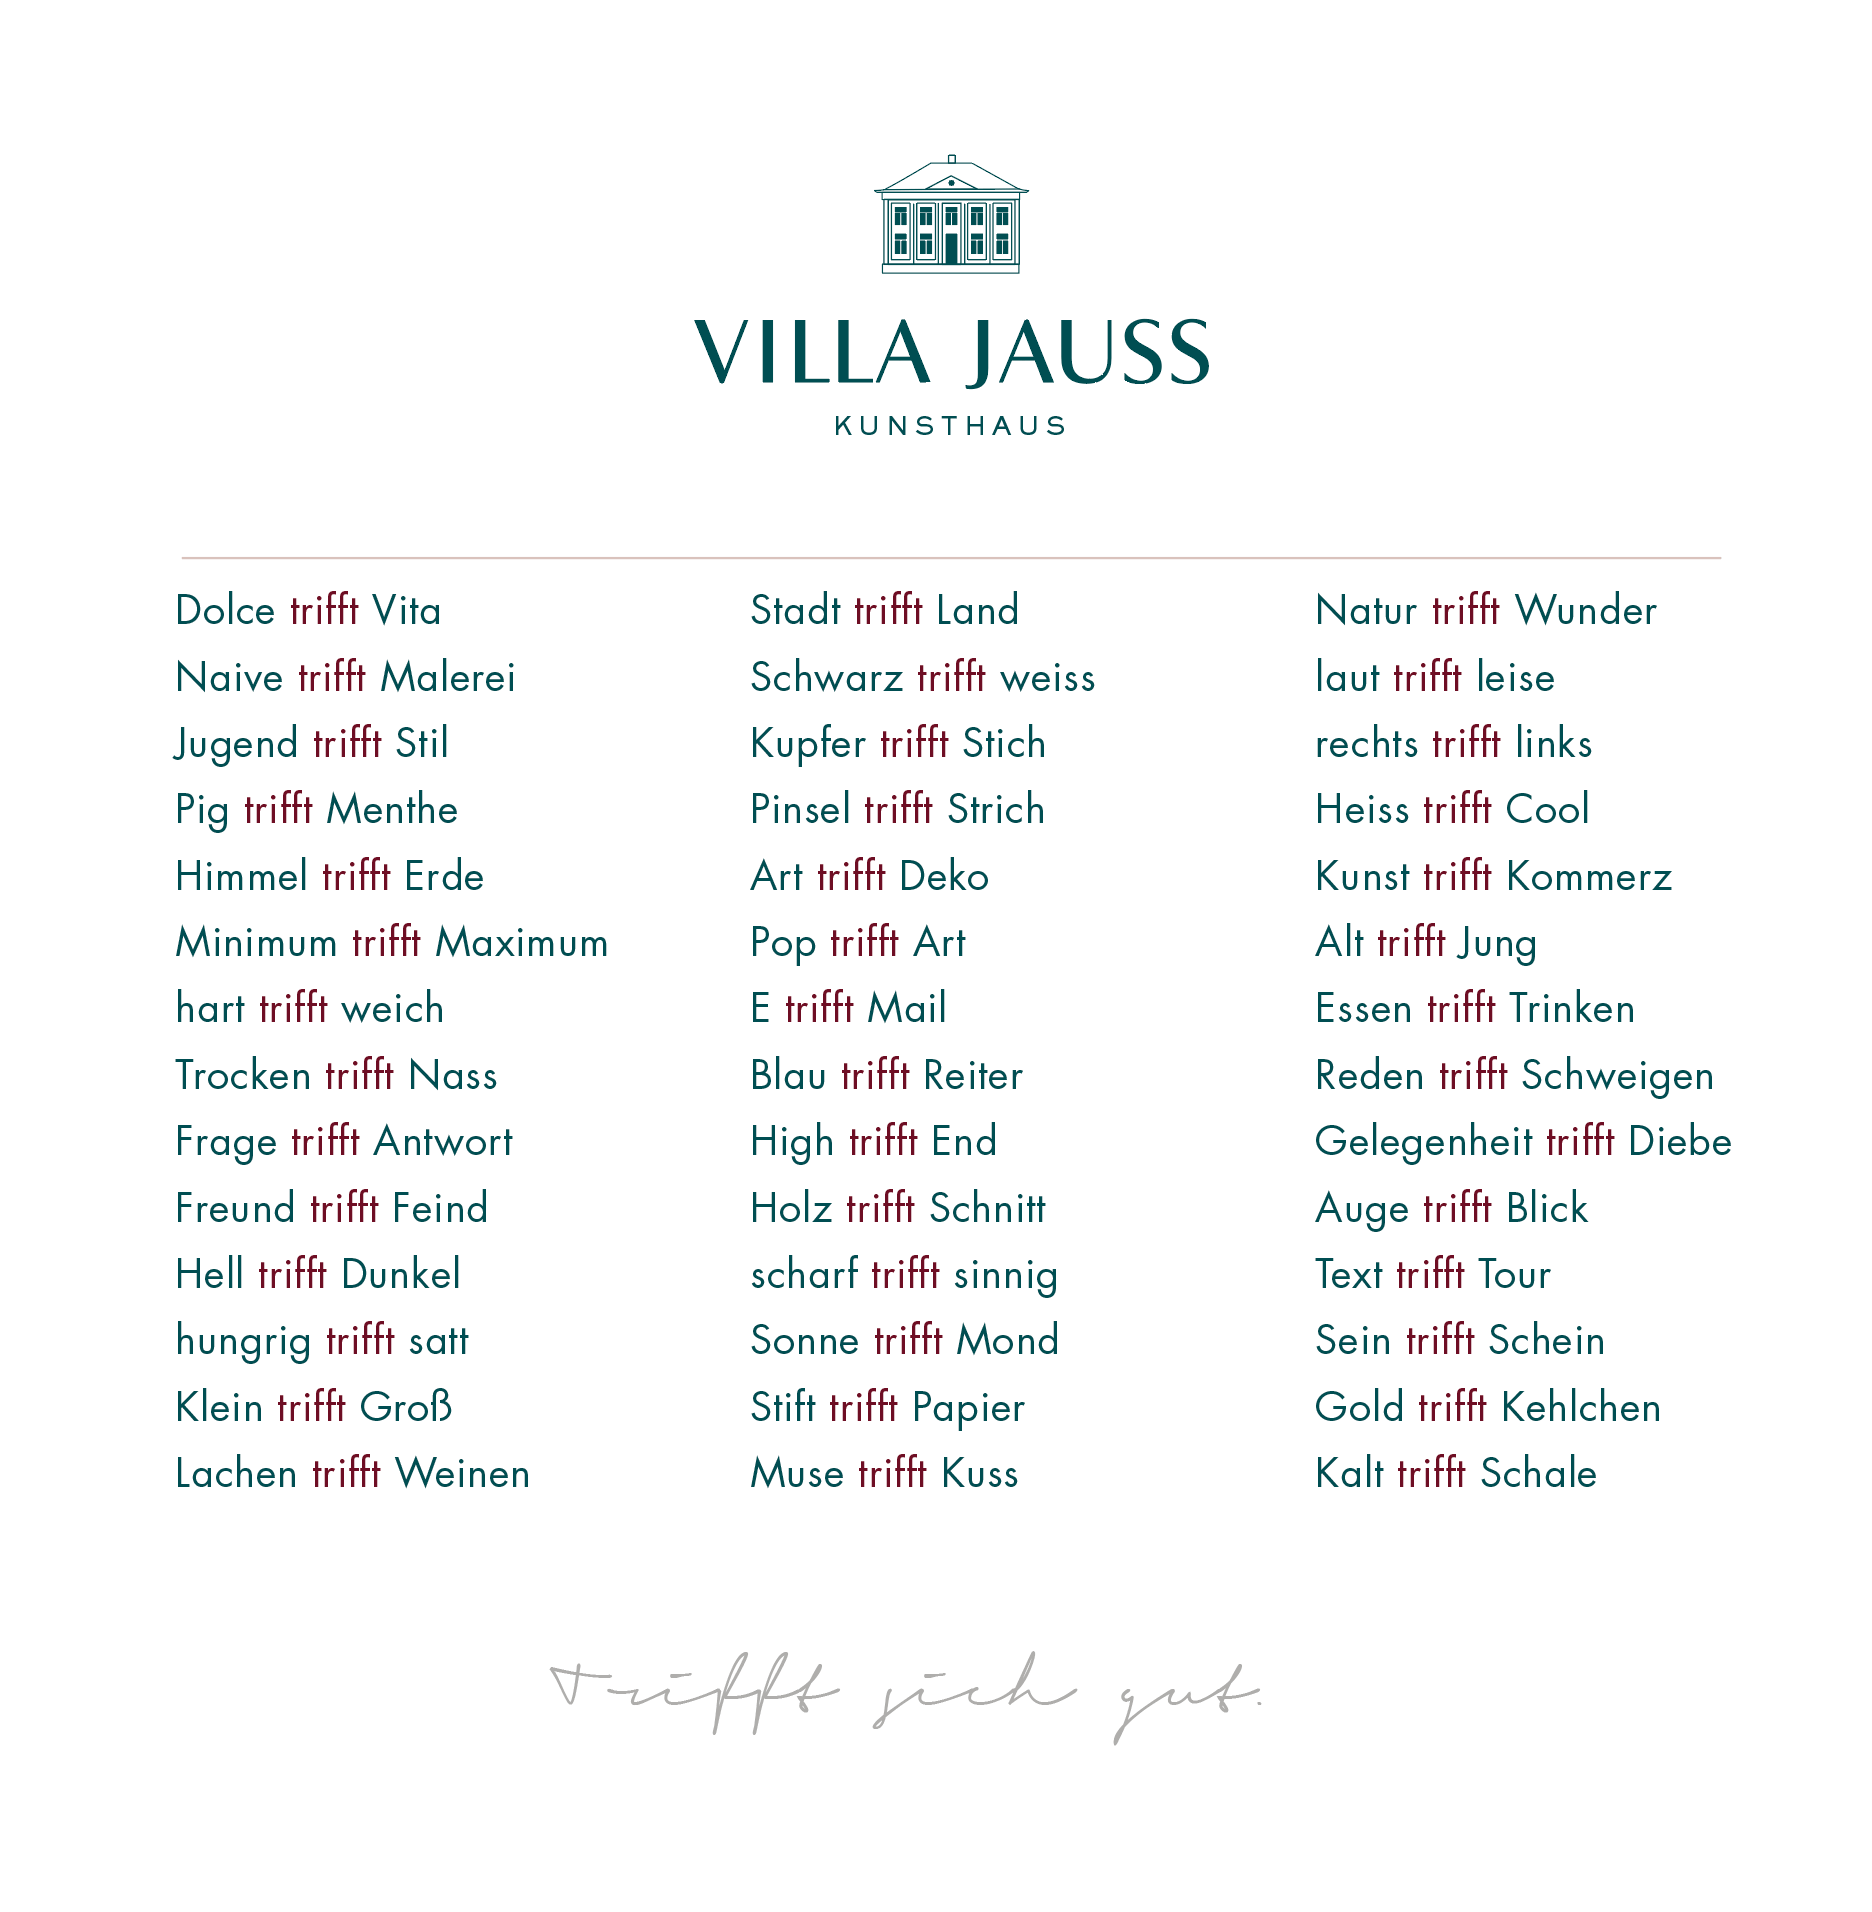 5Villa-Jauss-by-eimotion.png